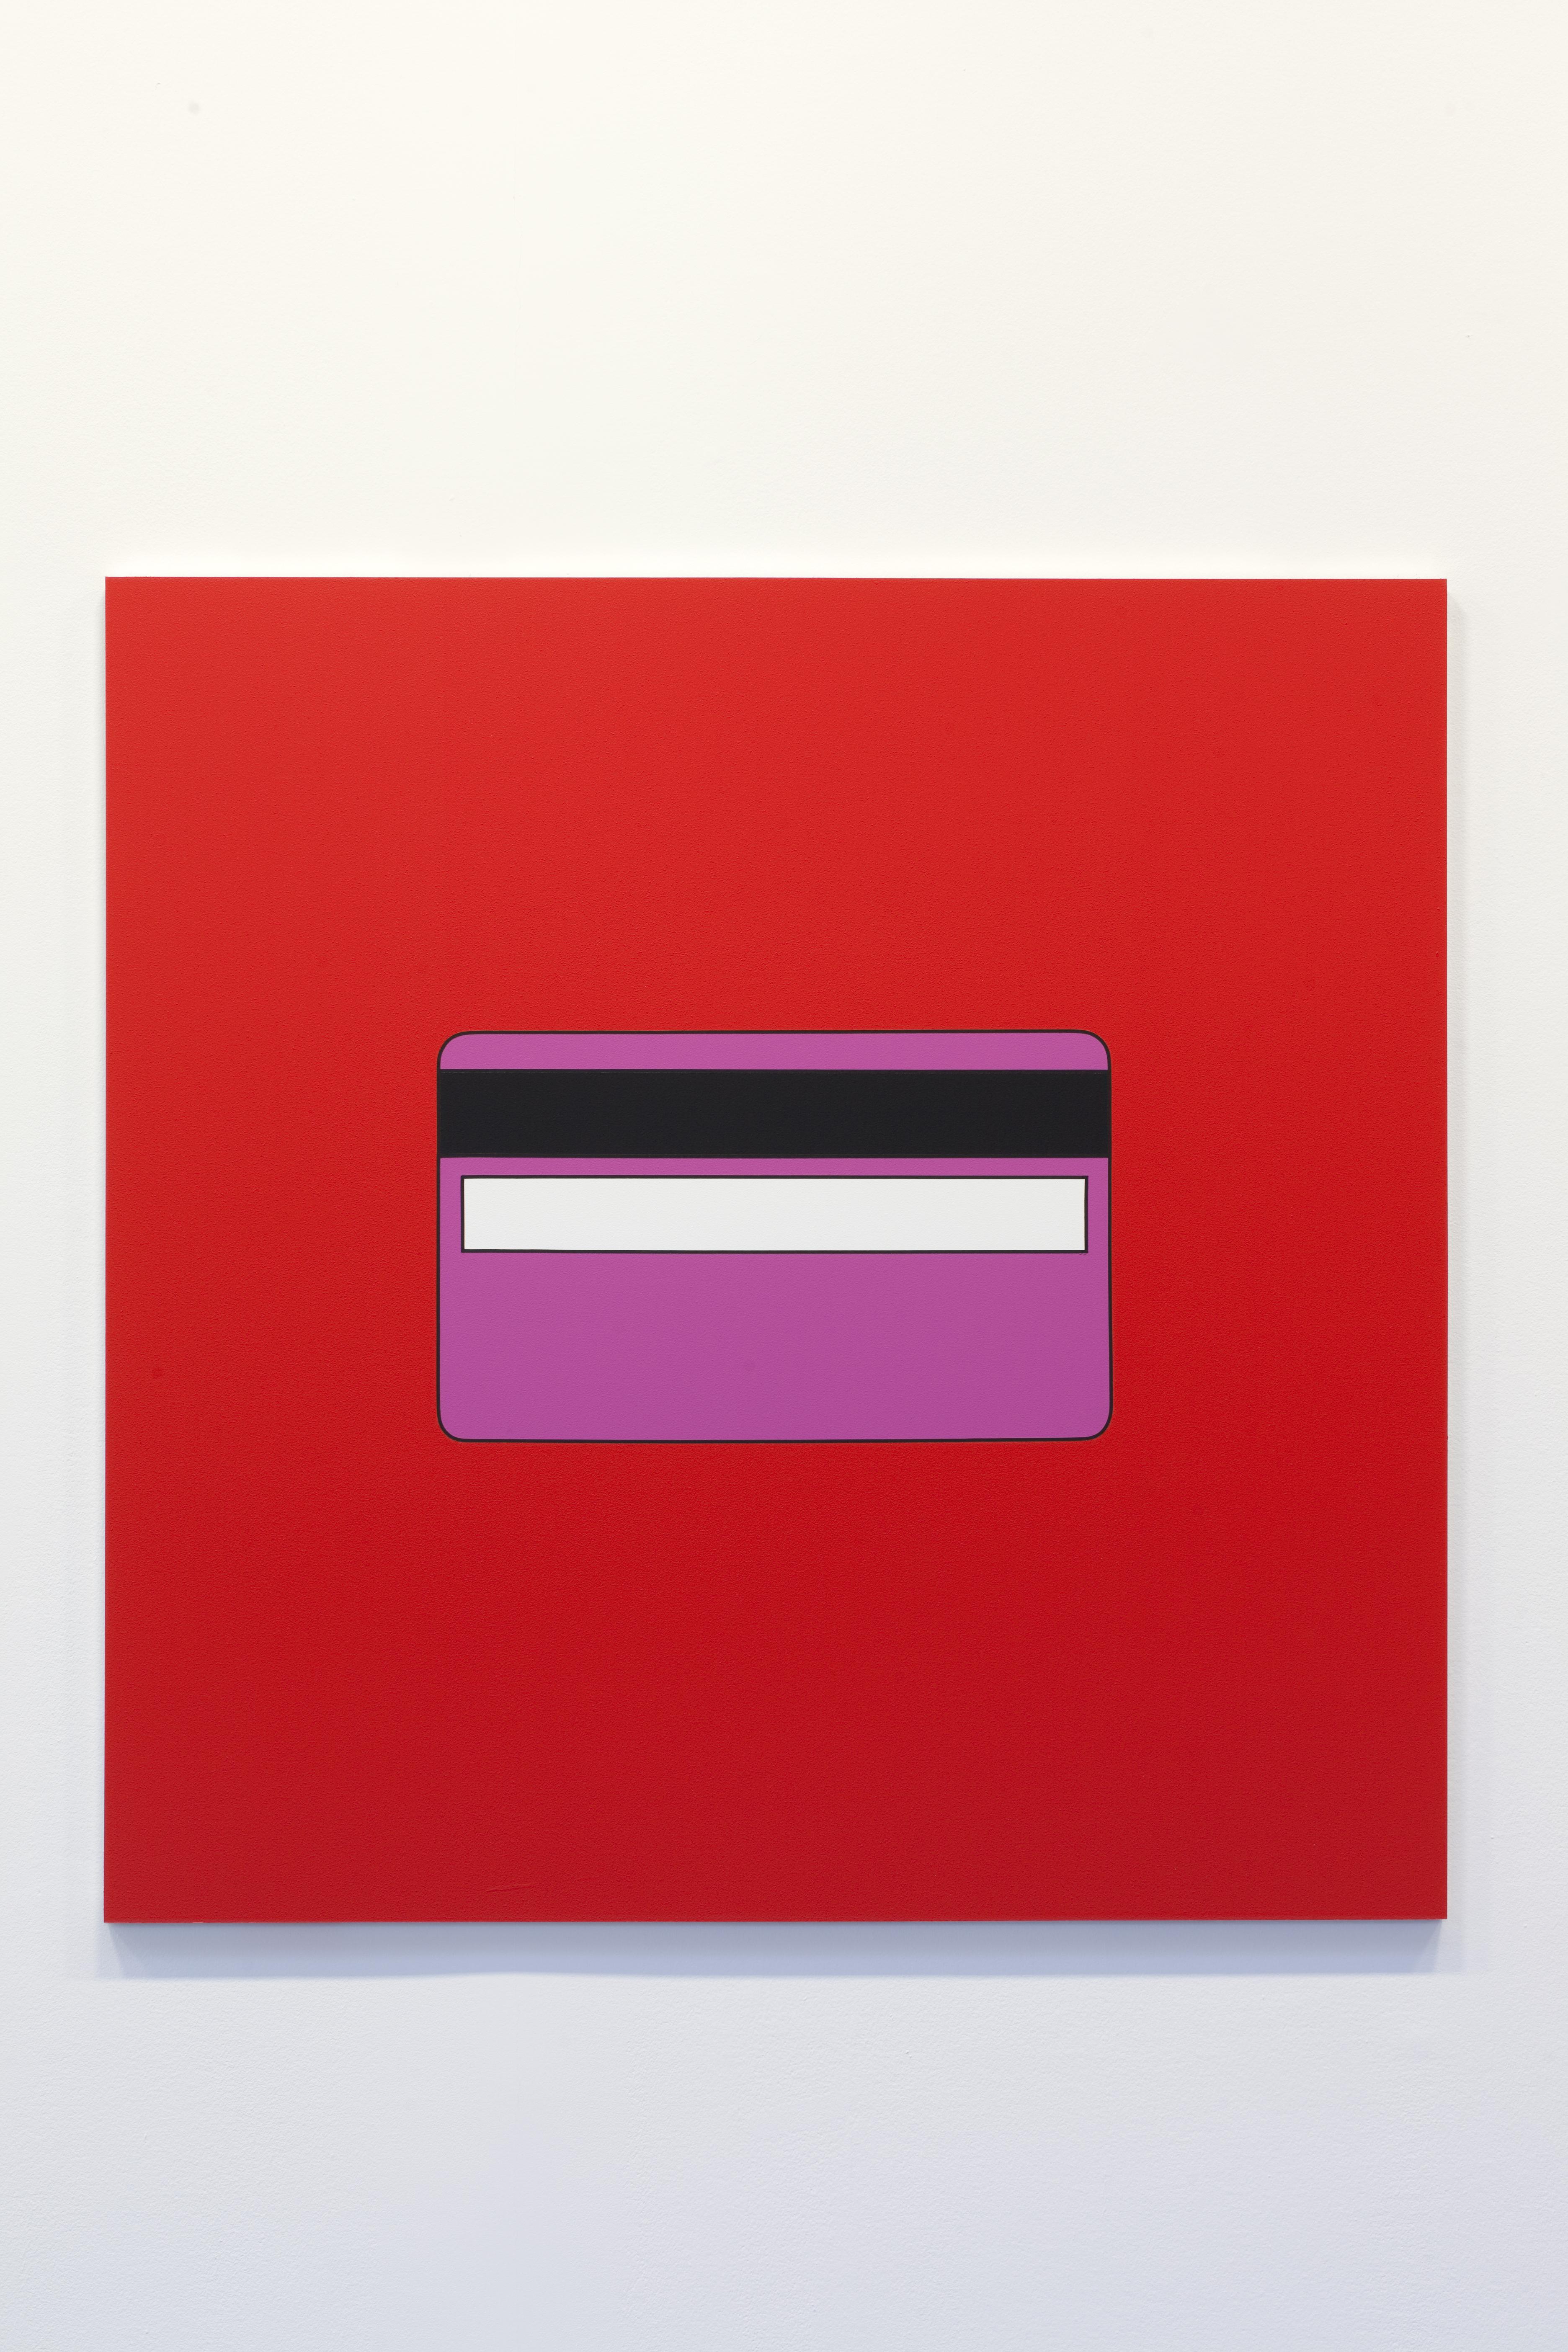 Michael Craig-Martin: Transience; Installation view; Serpentine Gallery, 25 November 2015 – 14 February 2016; Photograph © 2015 Jerry Hardman-Jones